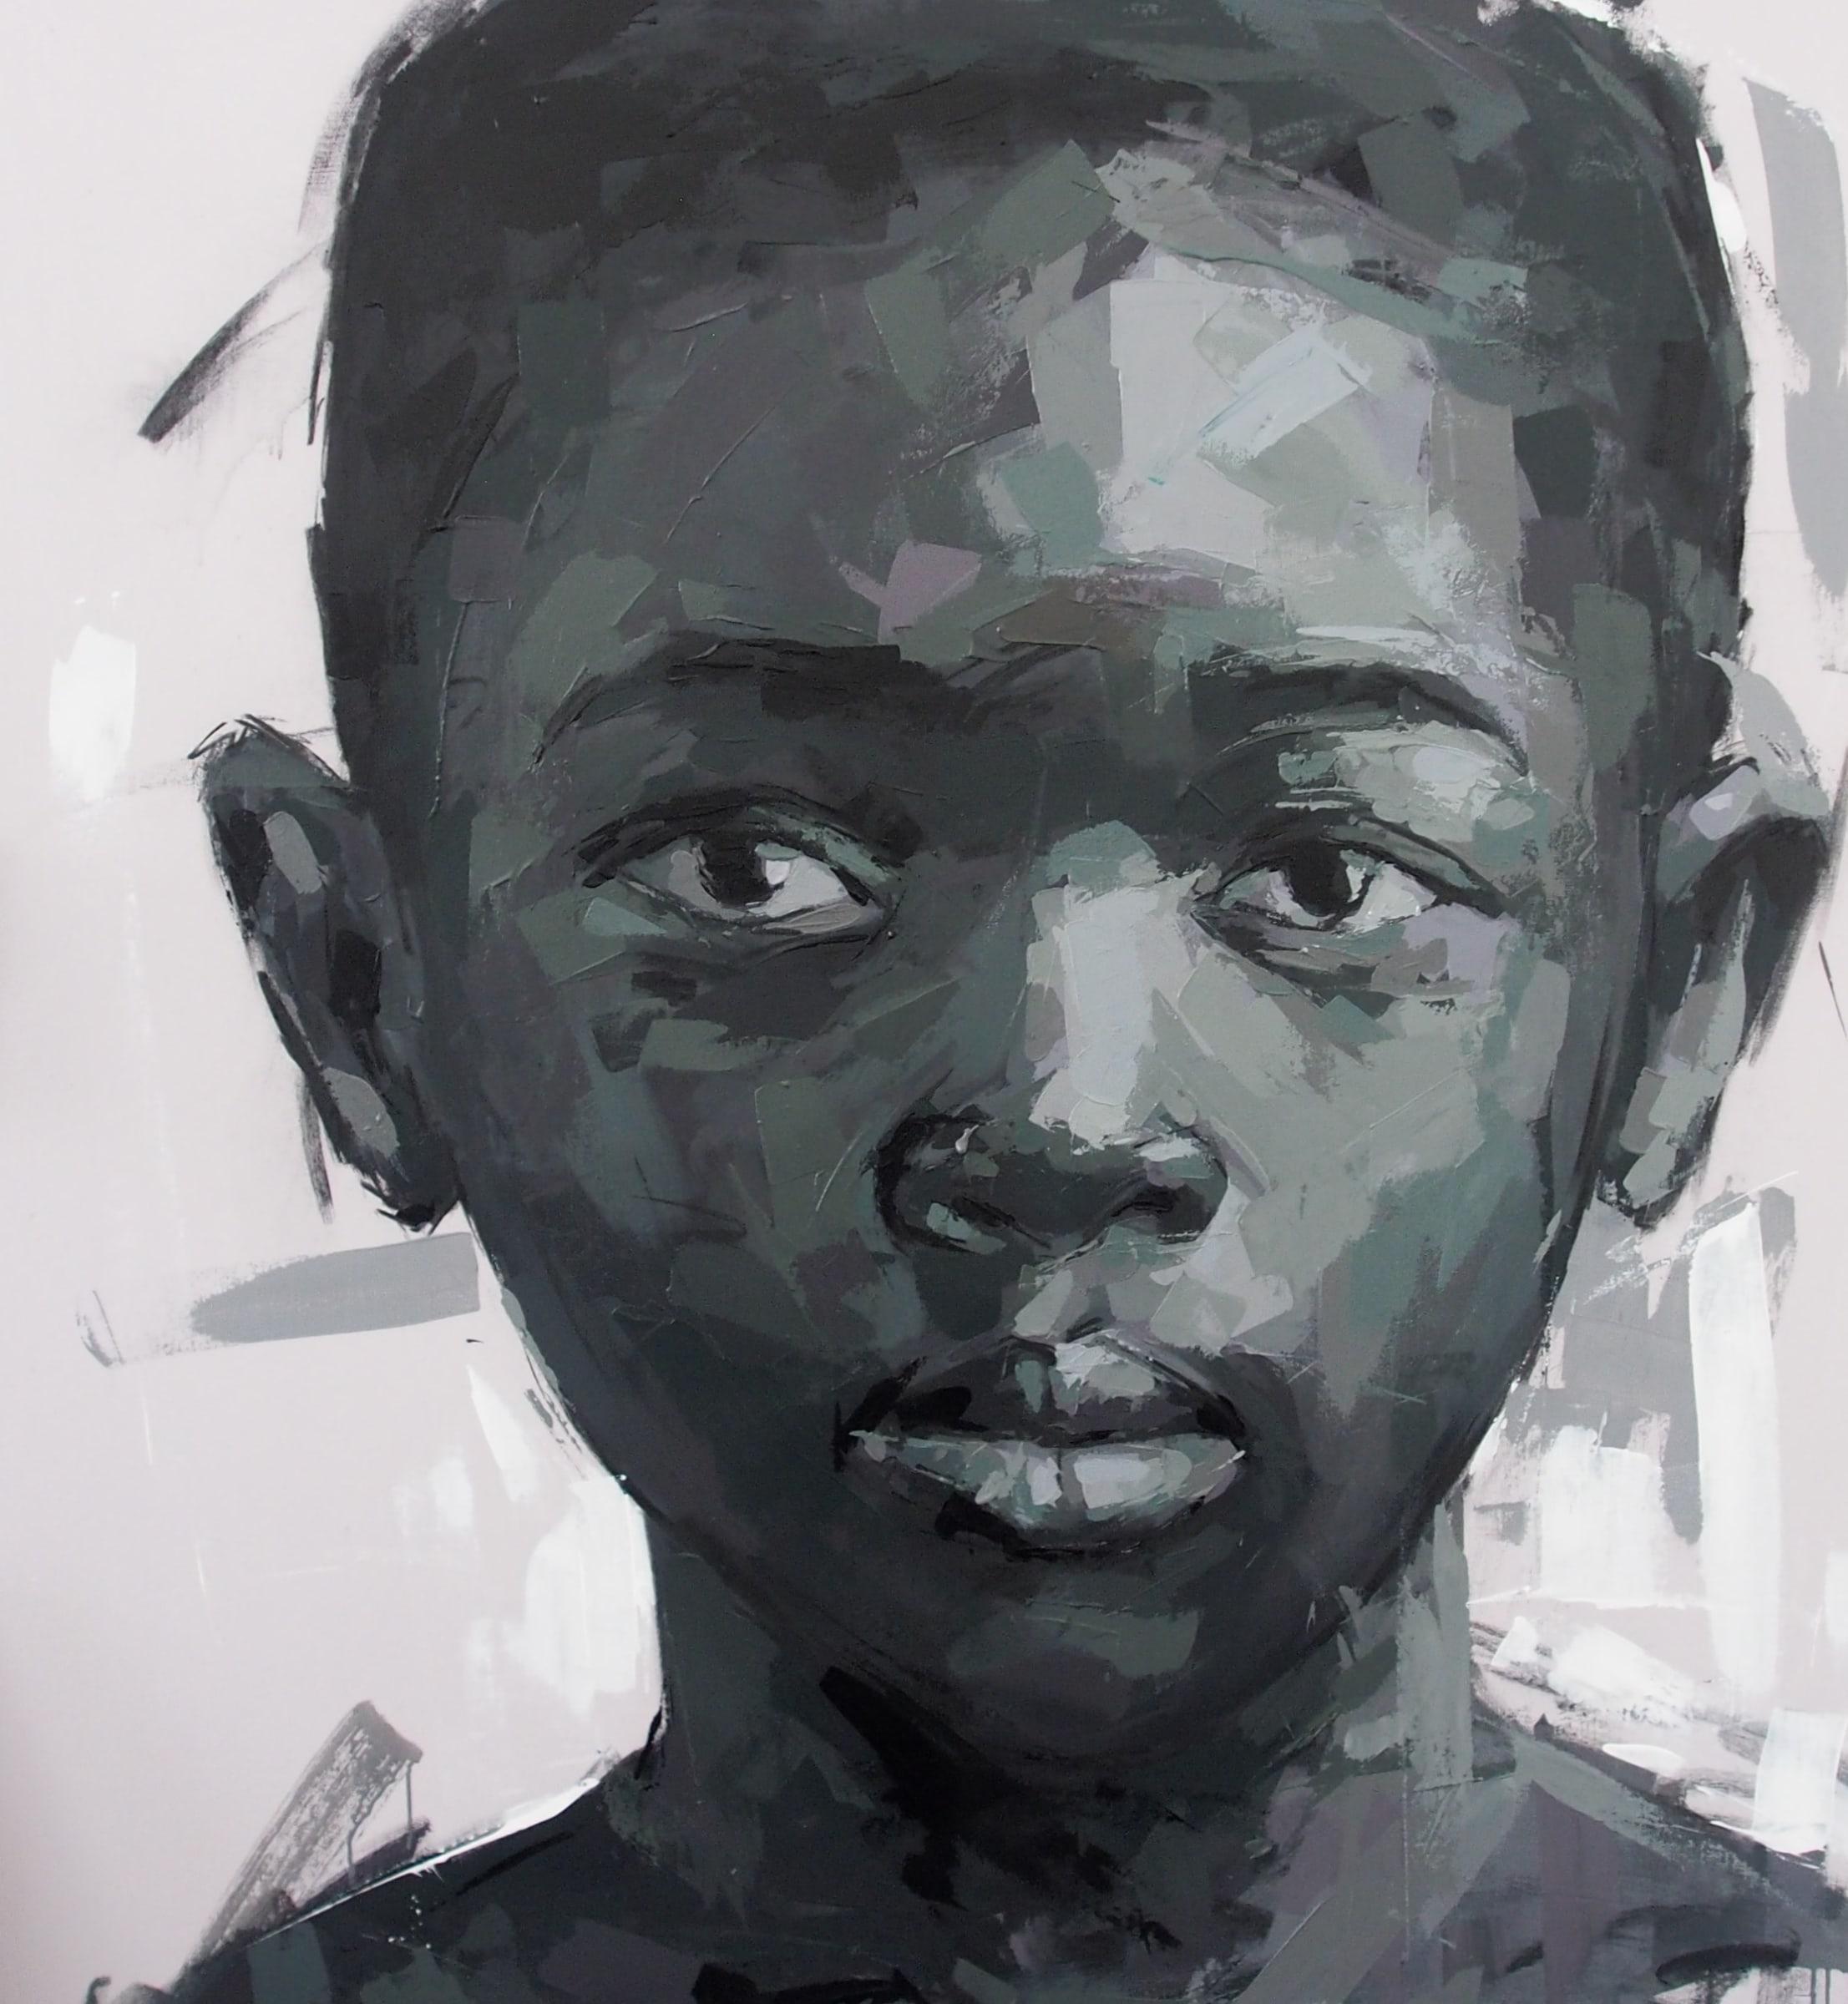 <span class=&#34;link fancybox-details-link&#34;><a href=&#34;/artists/39-solomon-omogboye/works/2015-solomon-omogboye-tender-gaze-2018/&#34;>View Detail Page</a></span><div class=&#34;artist&#34;><strong>Solomon Omogboye</strong></div> <div class=&#34;title&#34;><em>Tender Gaze</em>, 2018</div> <div class=&#34;medium&#34;>Acrylic On Canvas</div> <div class=&#34;dimensions&#34;>143.5cm x 159.5cm (164.4cm x 180.6cm framed)</div>